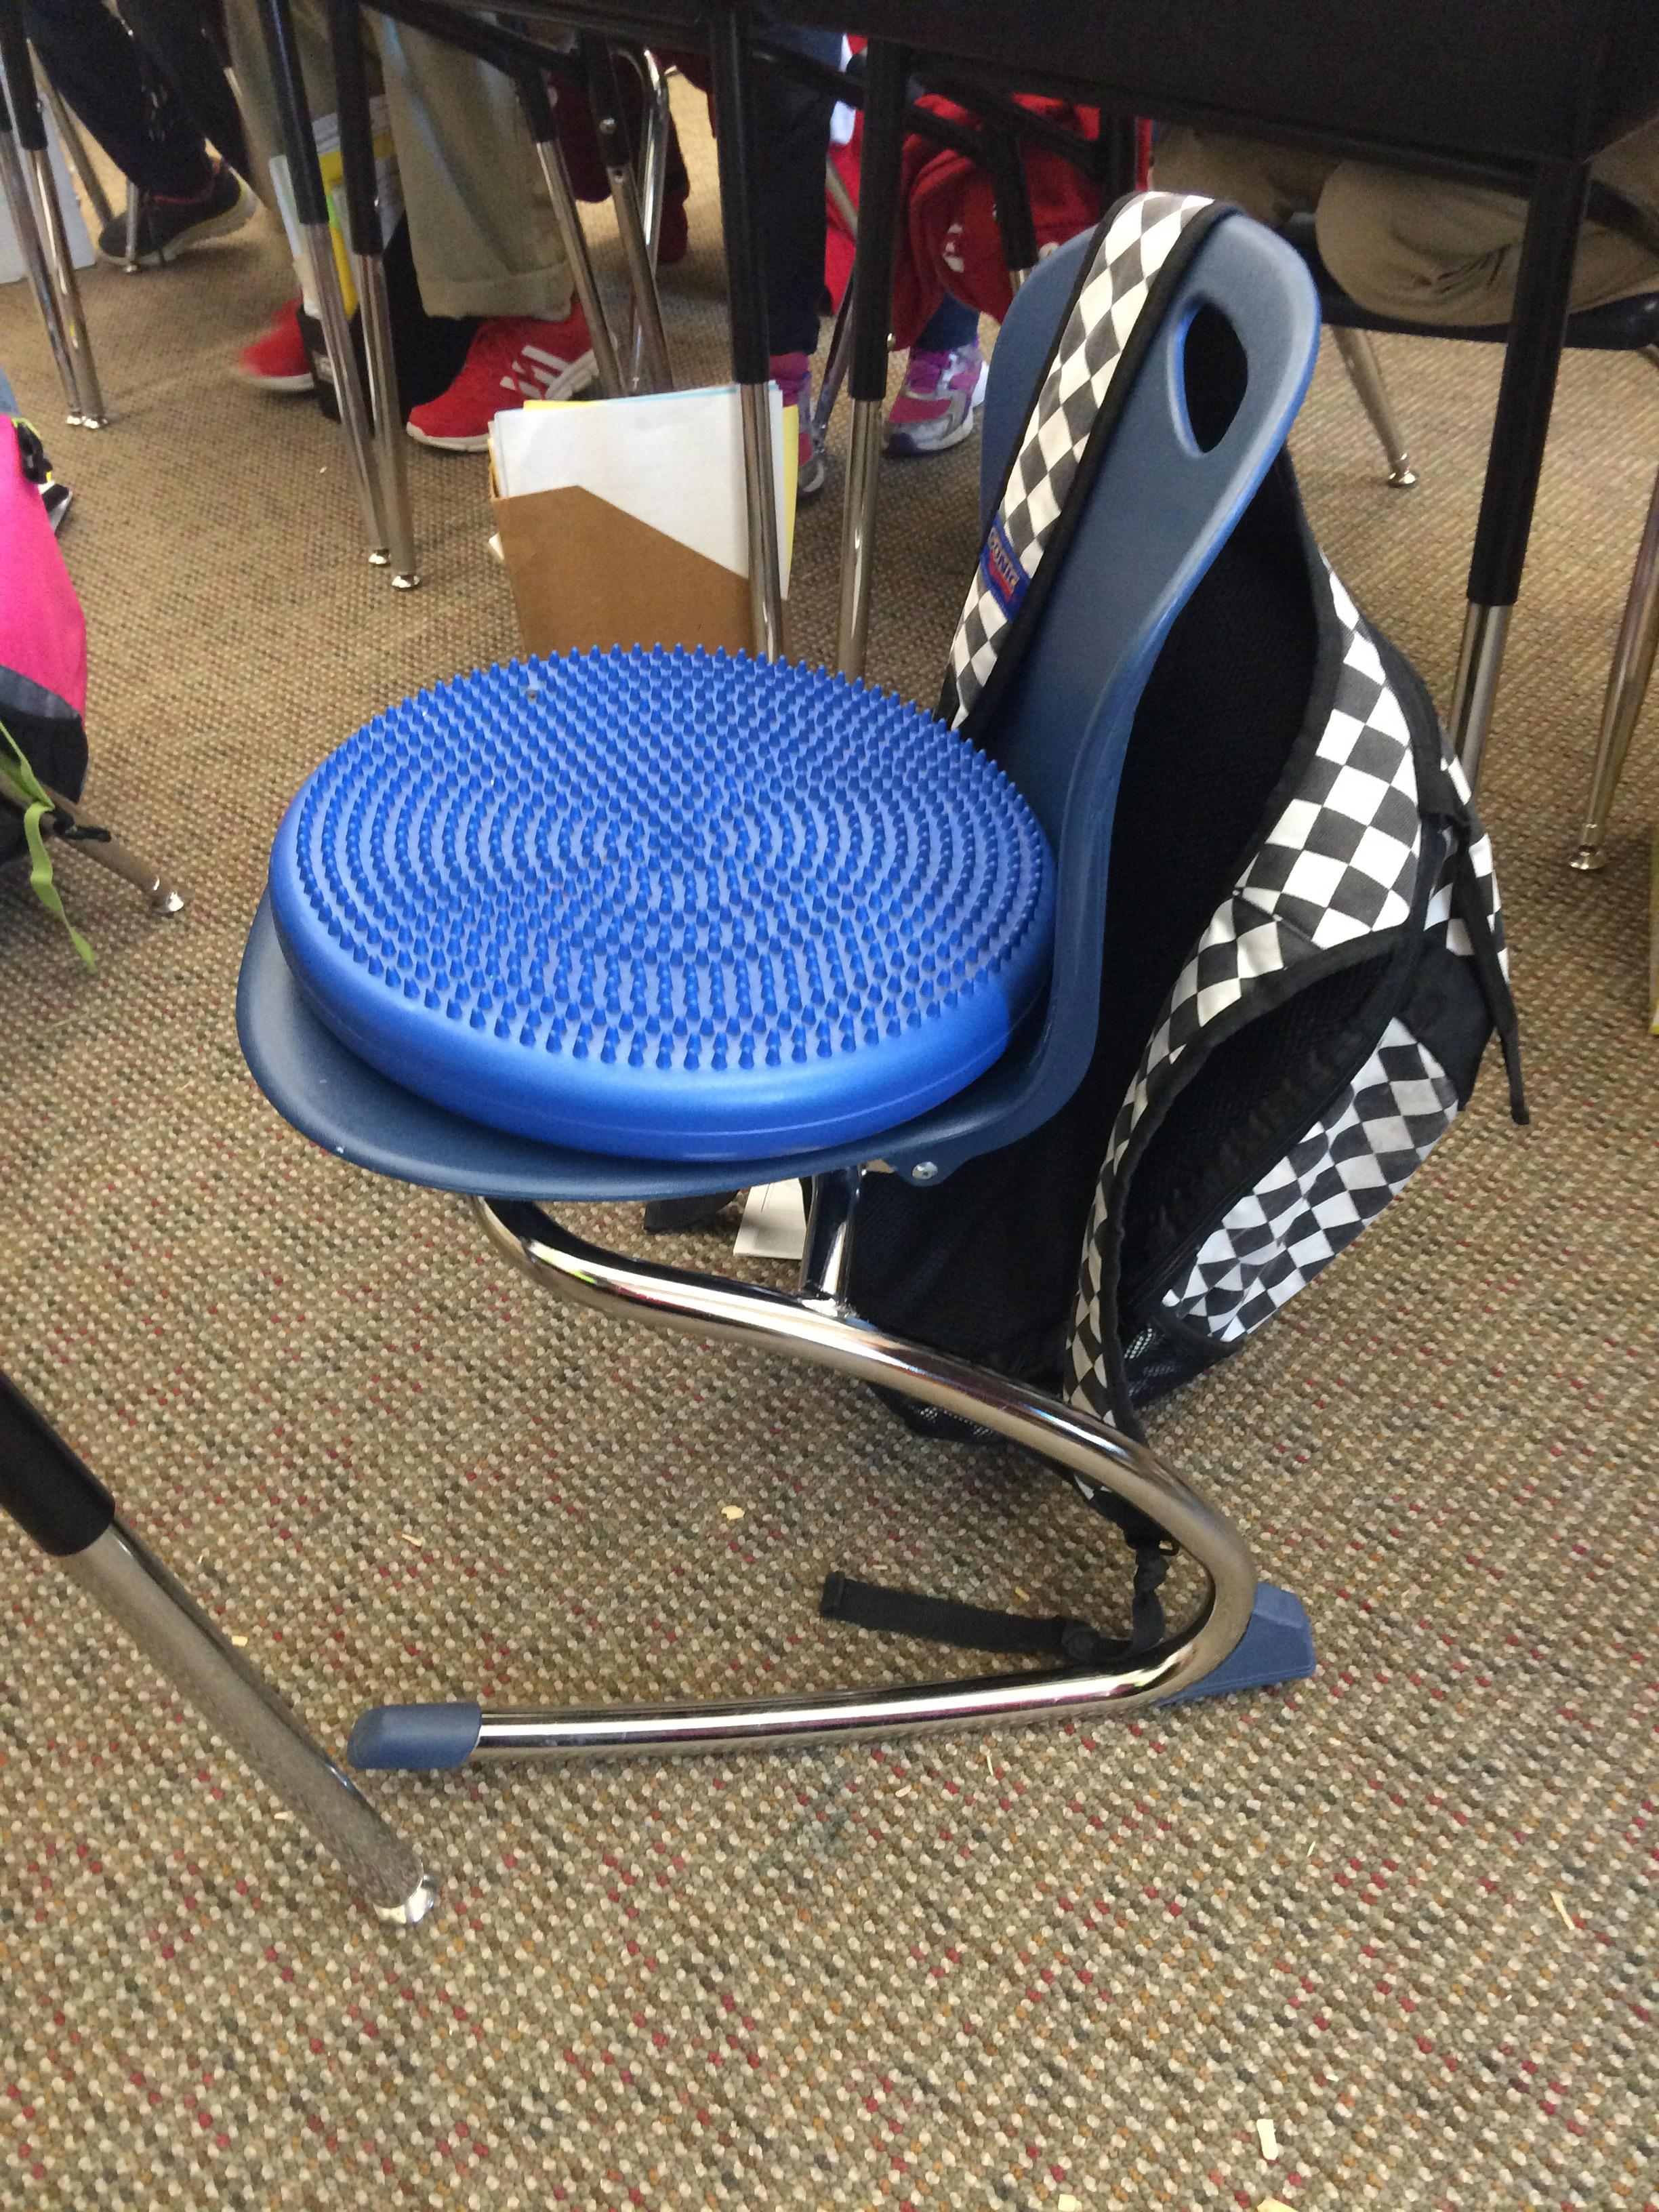 Beautiful Wobble Chair Rtty1 Com Rtty1 Com